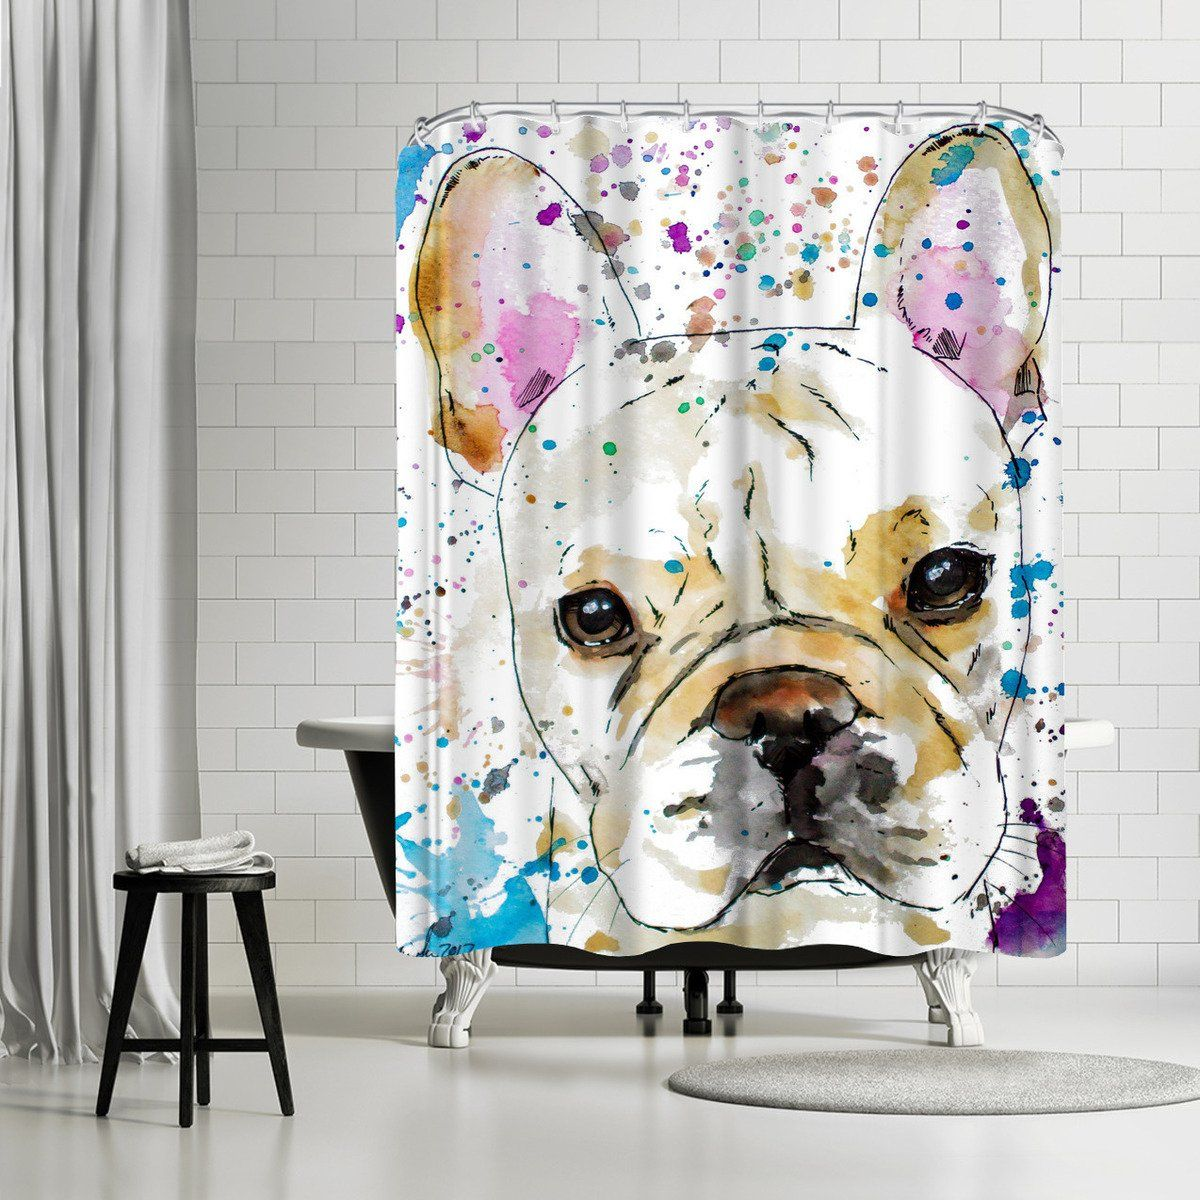 French Bulldog By Allison Gray Shower Curtain Gray Shower Curtains Allison Grey Grey French Bulldog